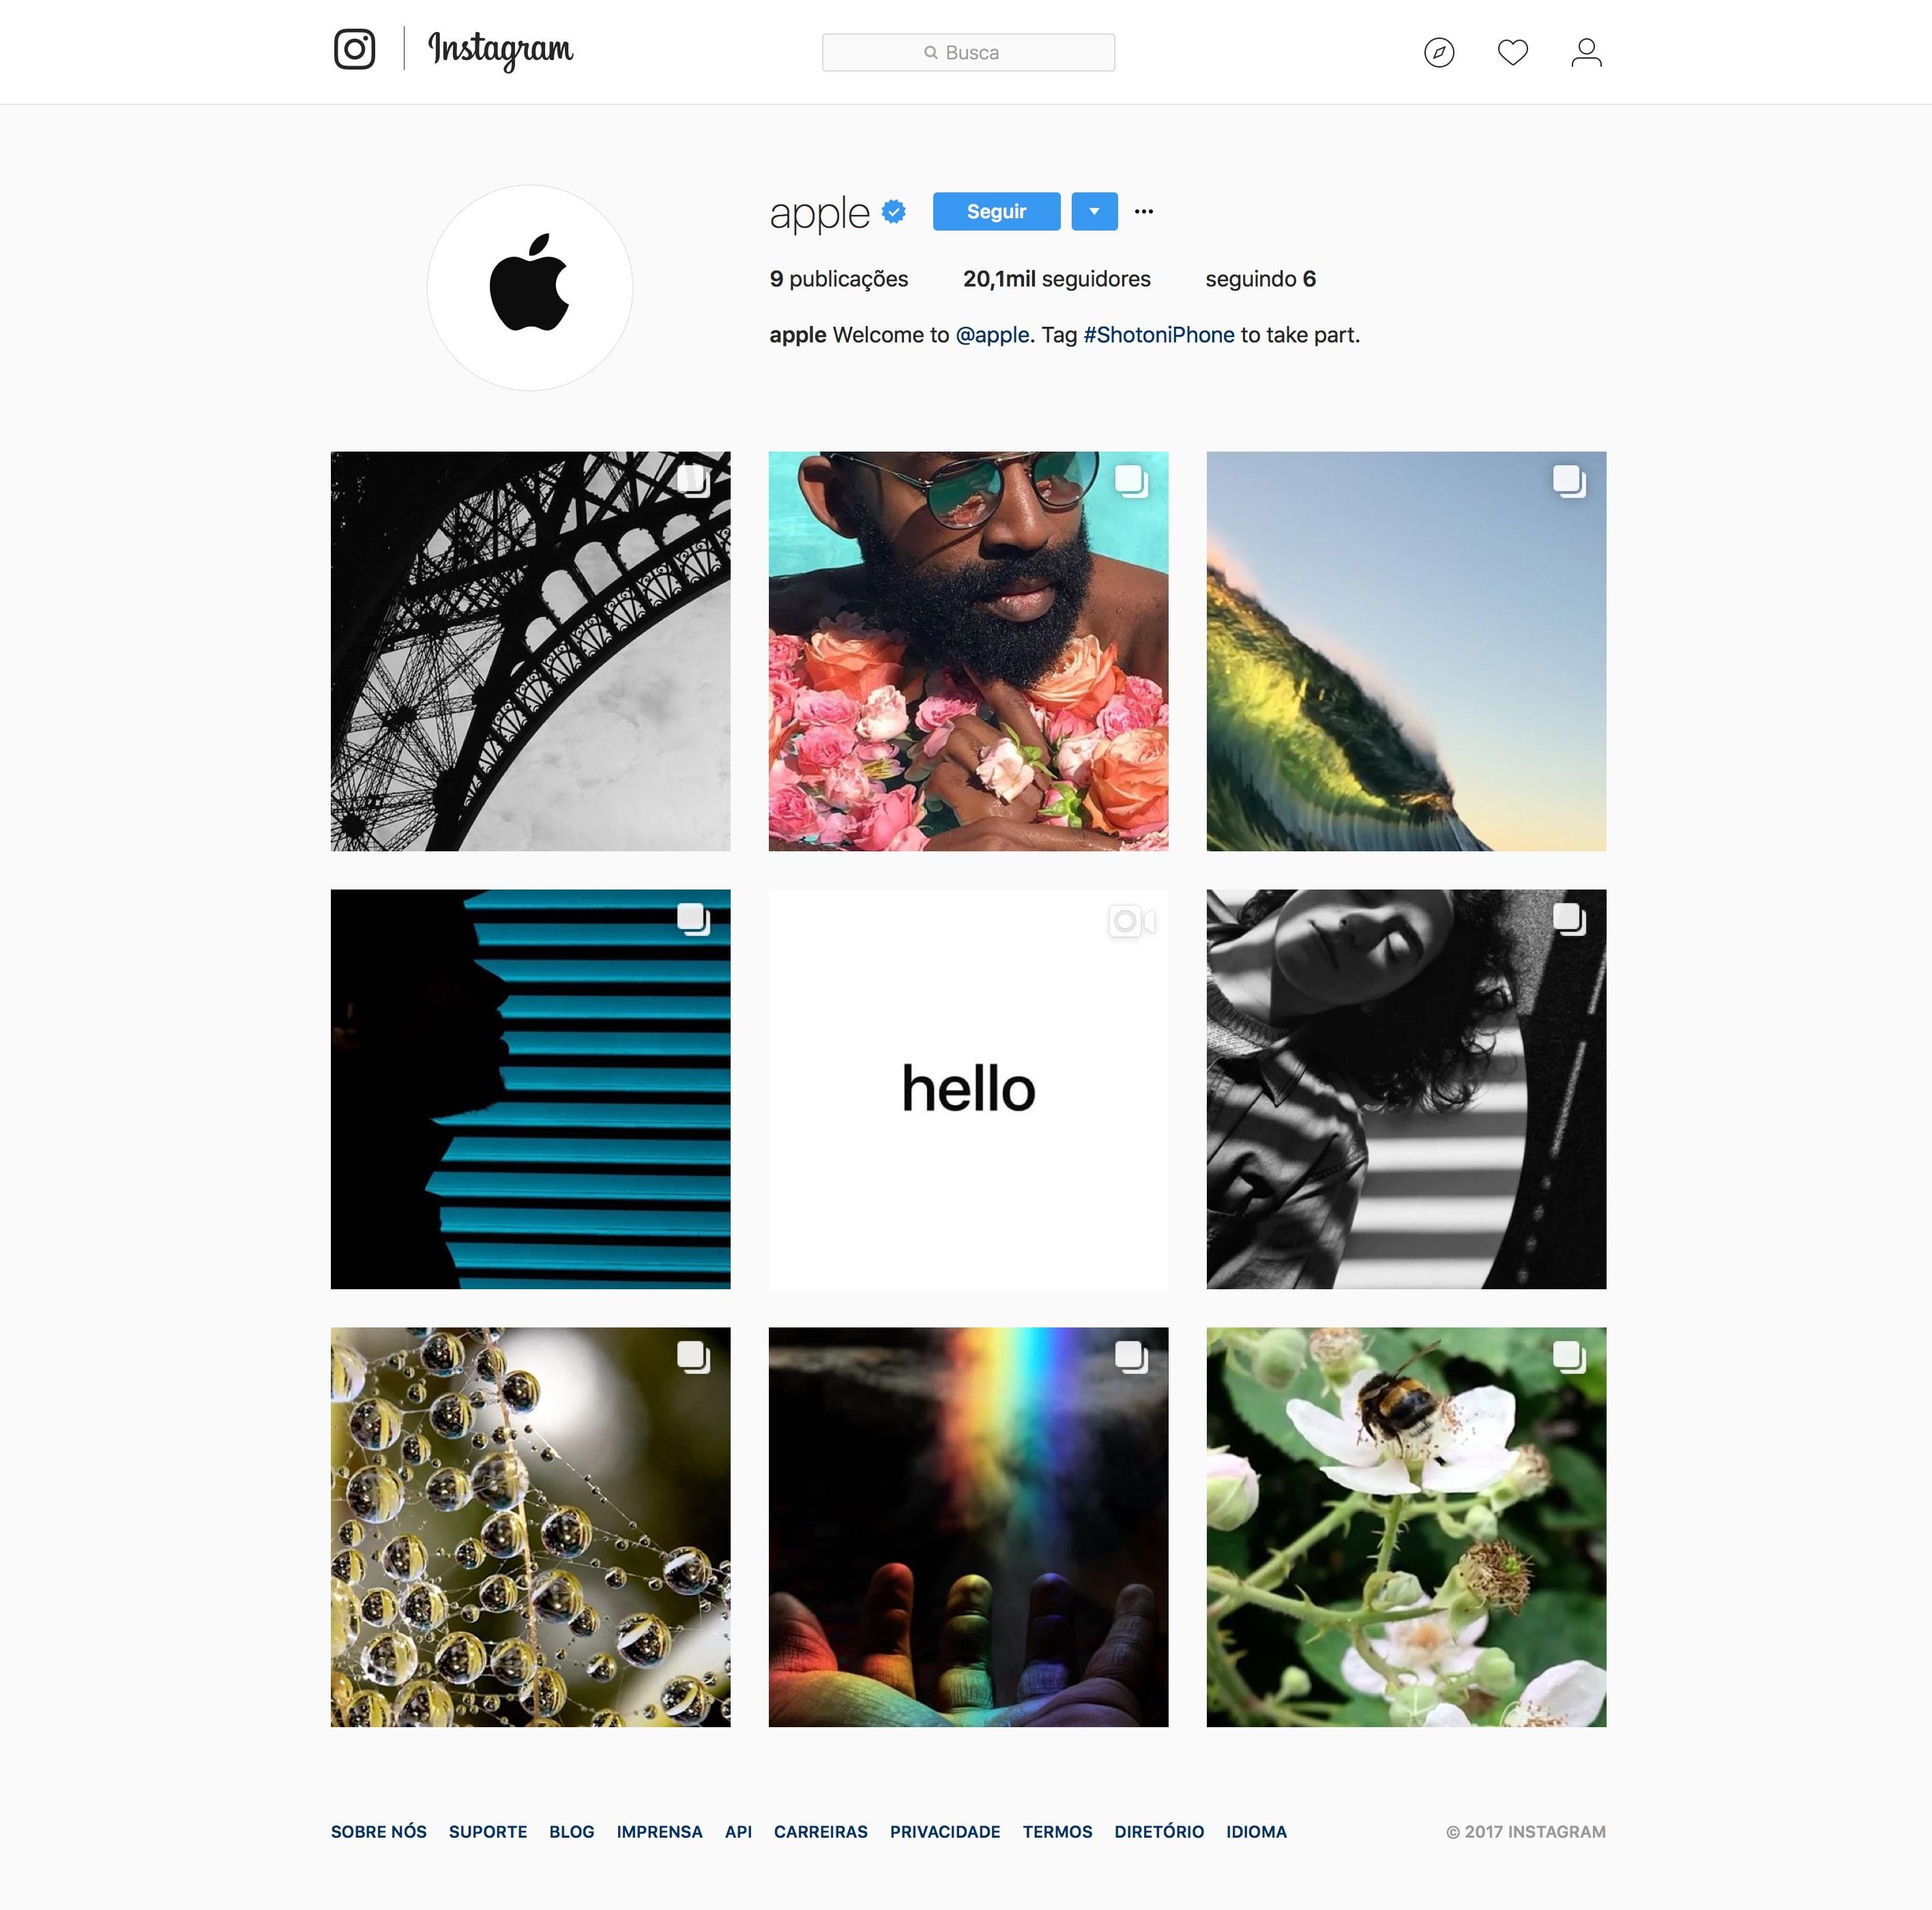 Fotos dos novos iPhones mostram leitor de digitais na traseira — Rumor